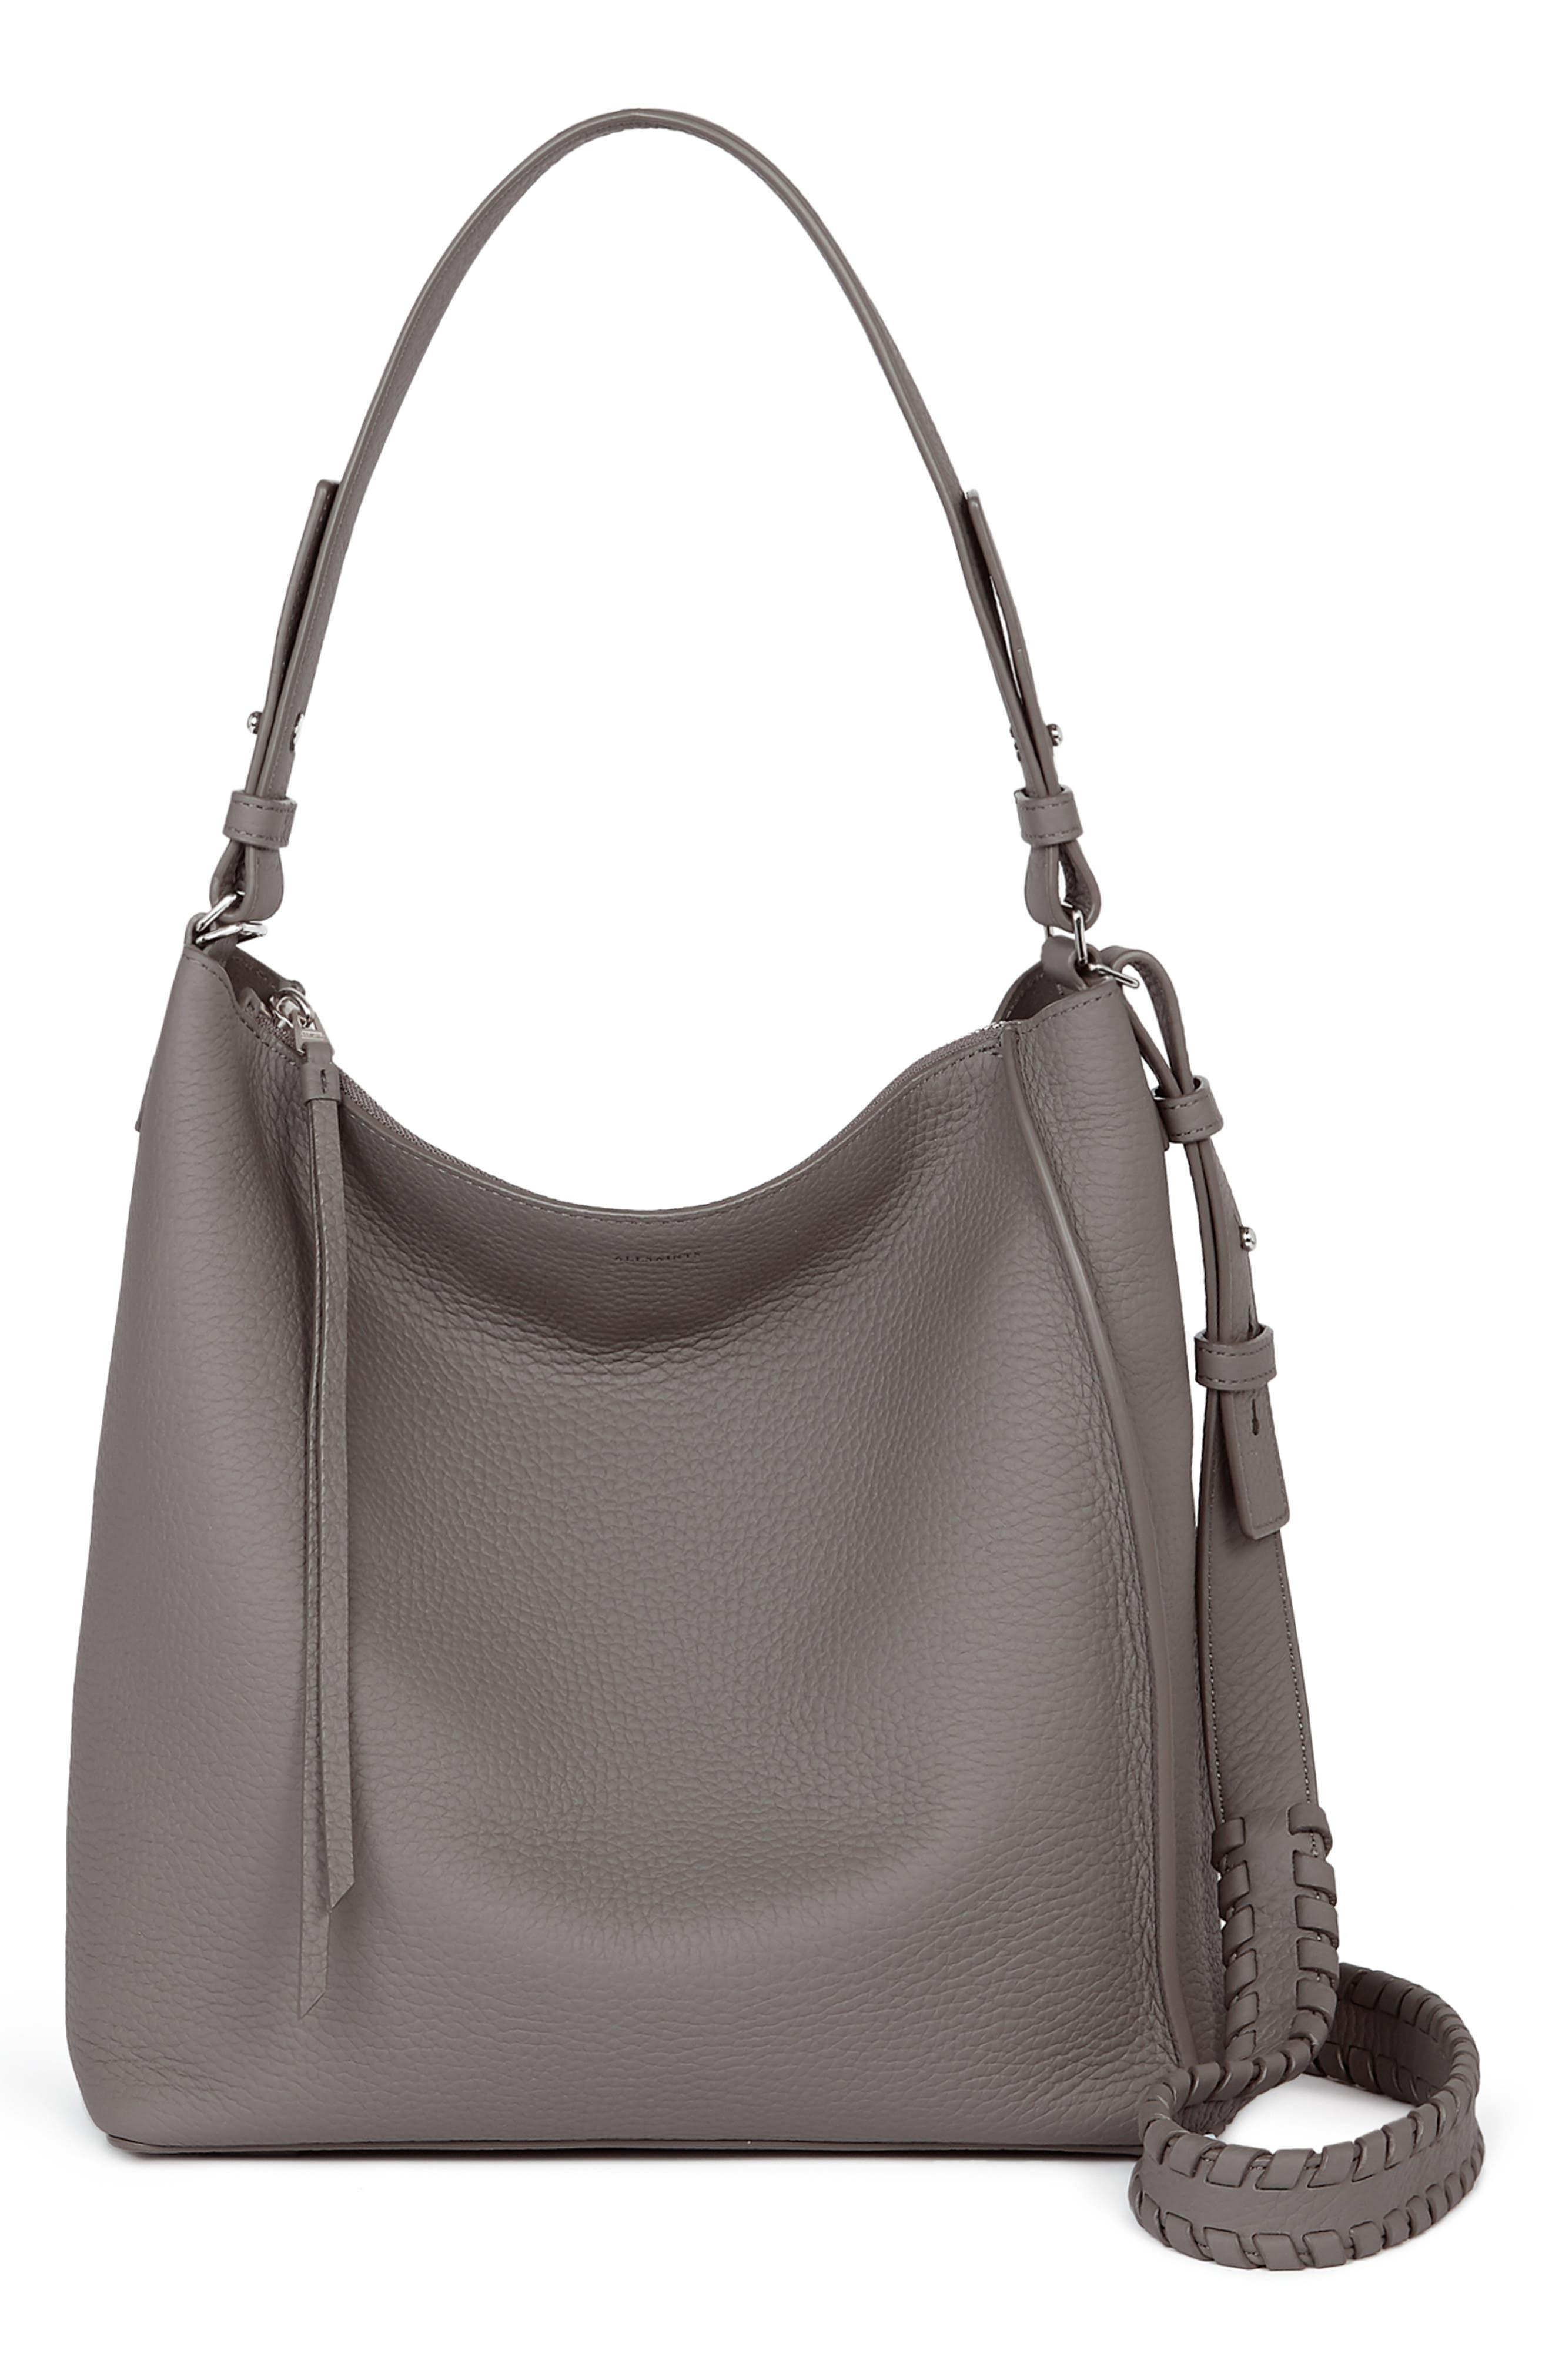 ALLSAINTS, 'Kita' Leather Shoulder/Crossbody Bag, Main thumbnail 1, color, STORM GREY